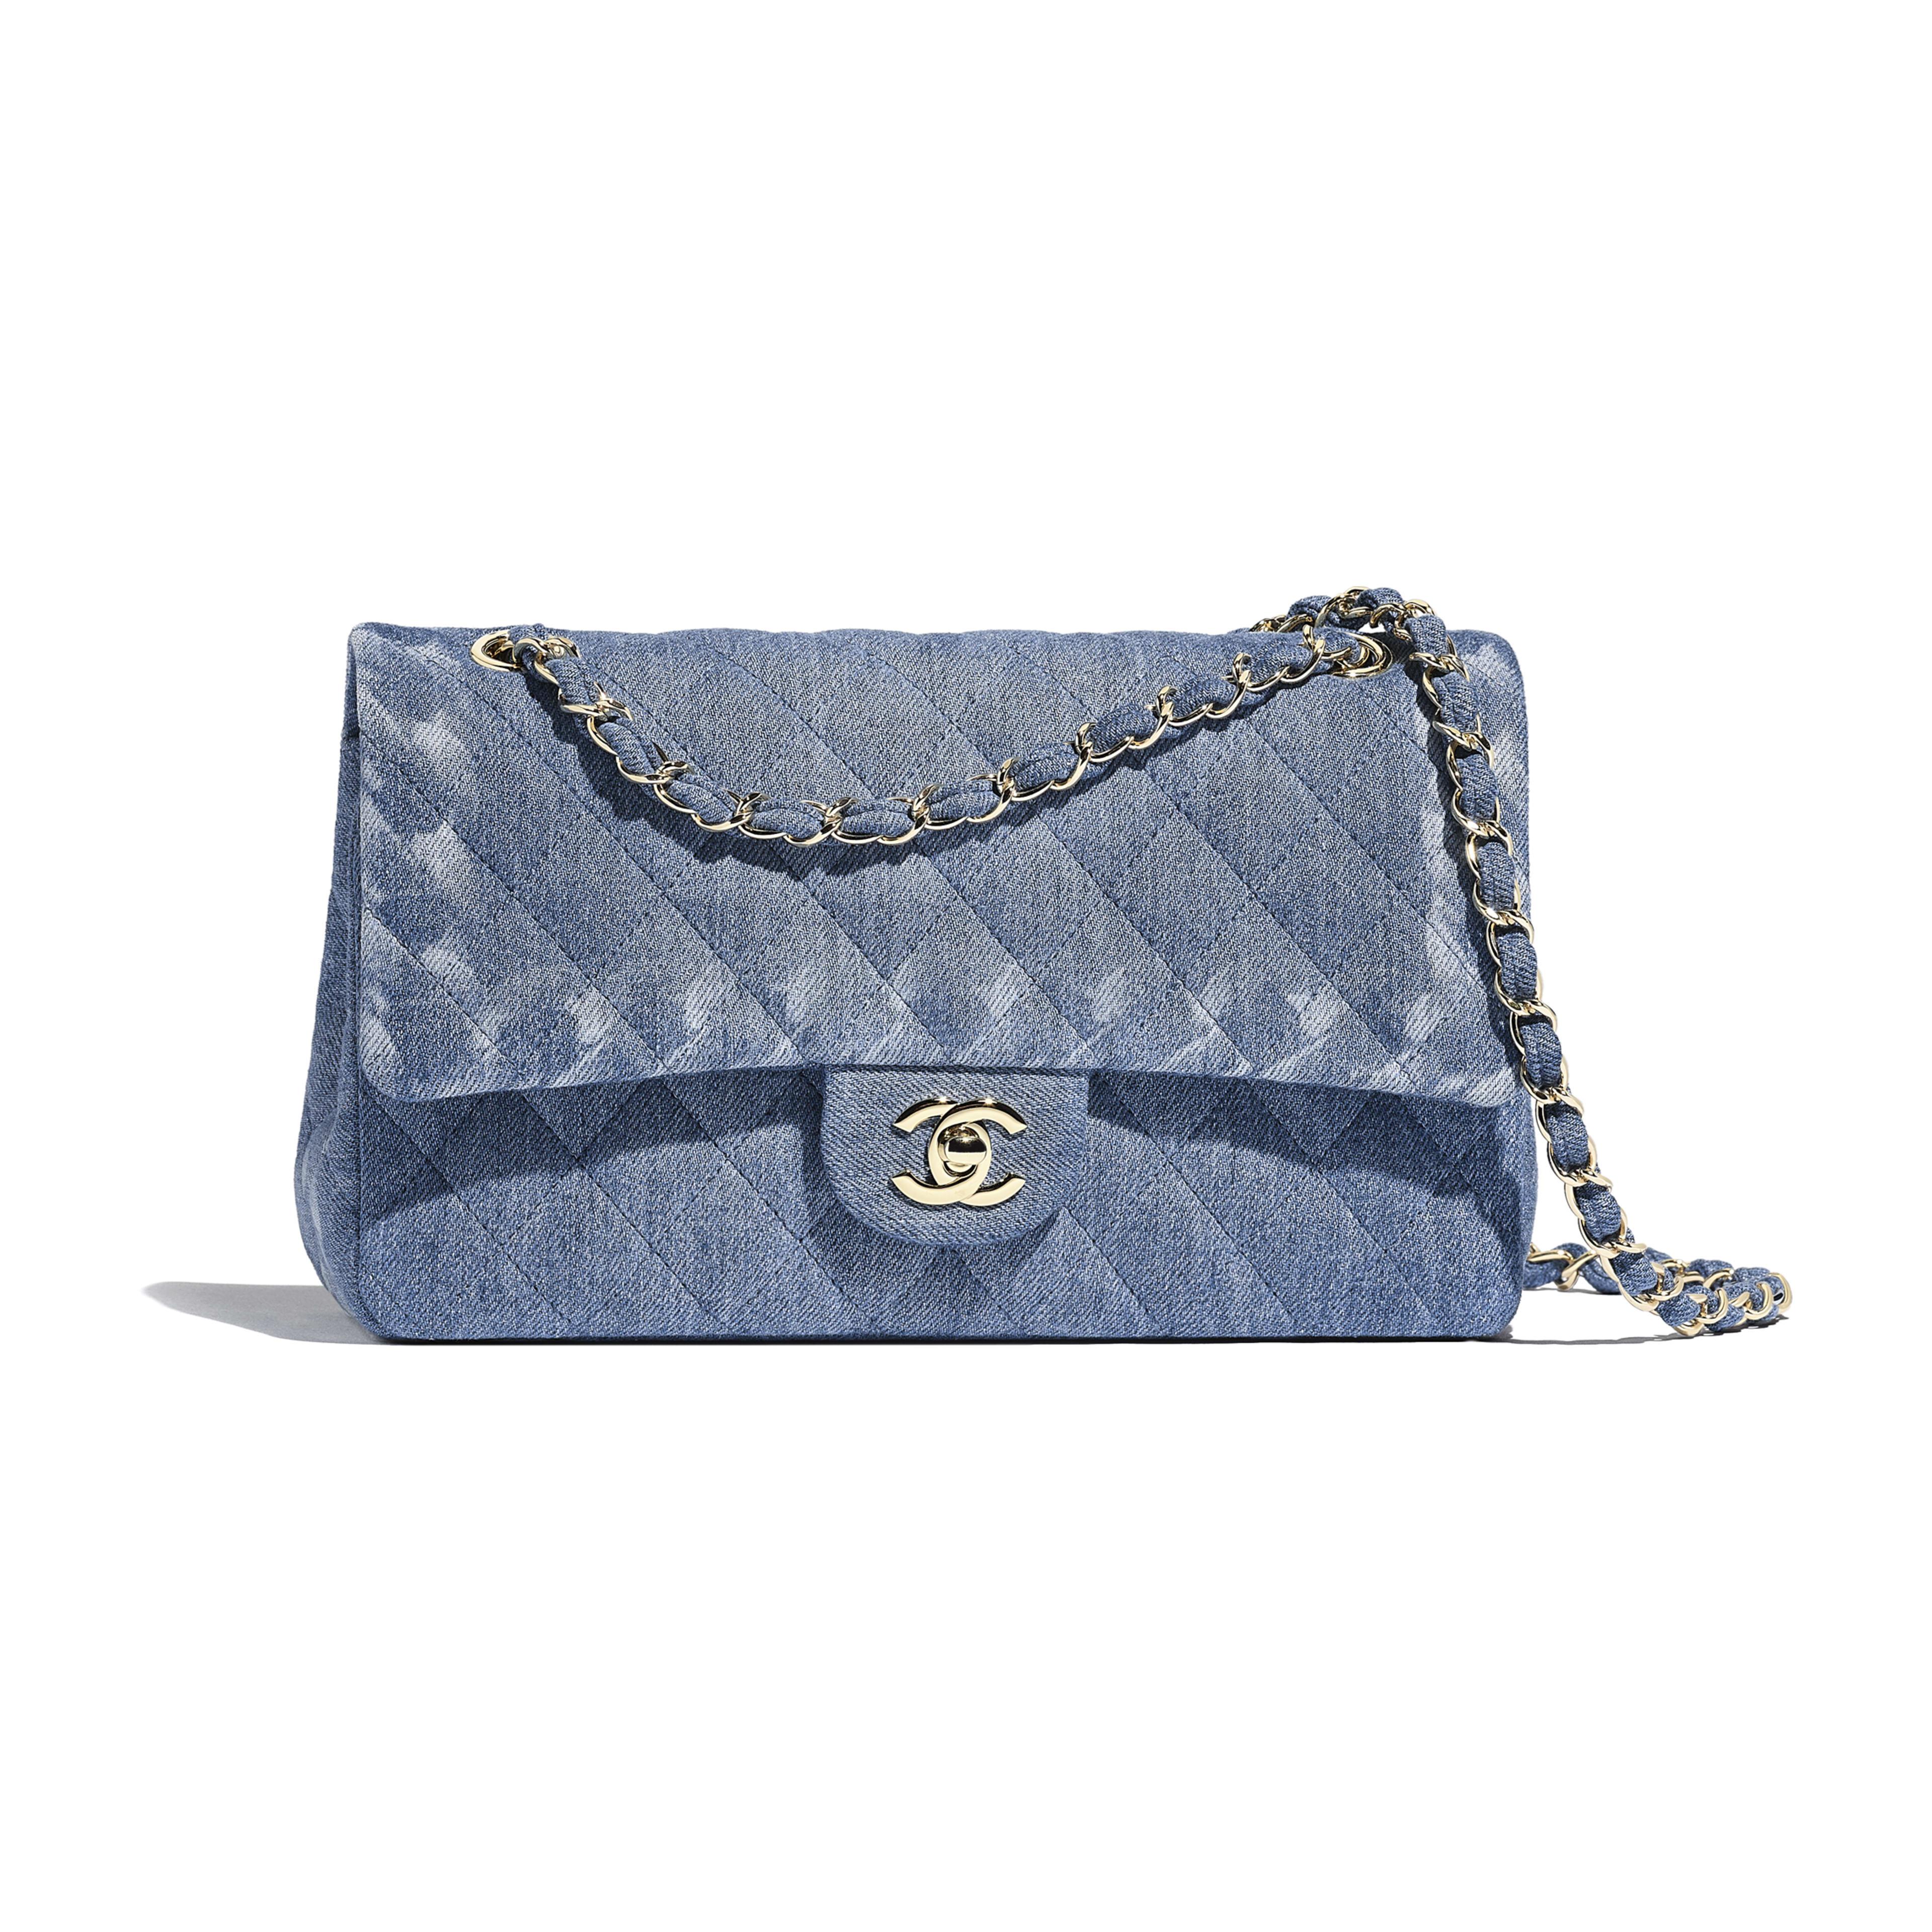 Classic Handbag - Blue - Denim & Gold-Tone Metal - Default view - see full sized version